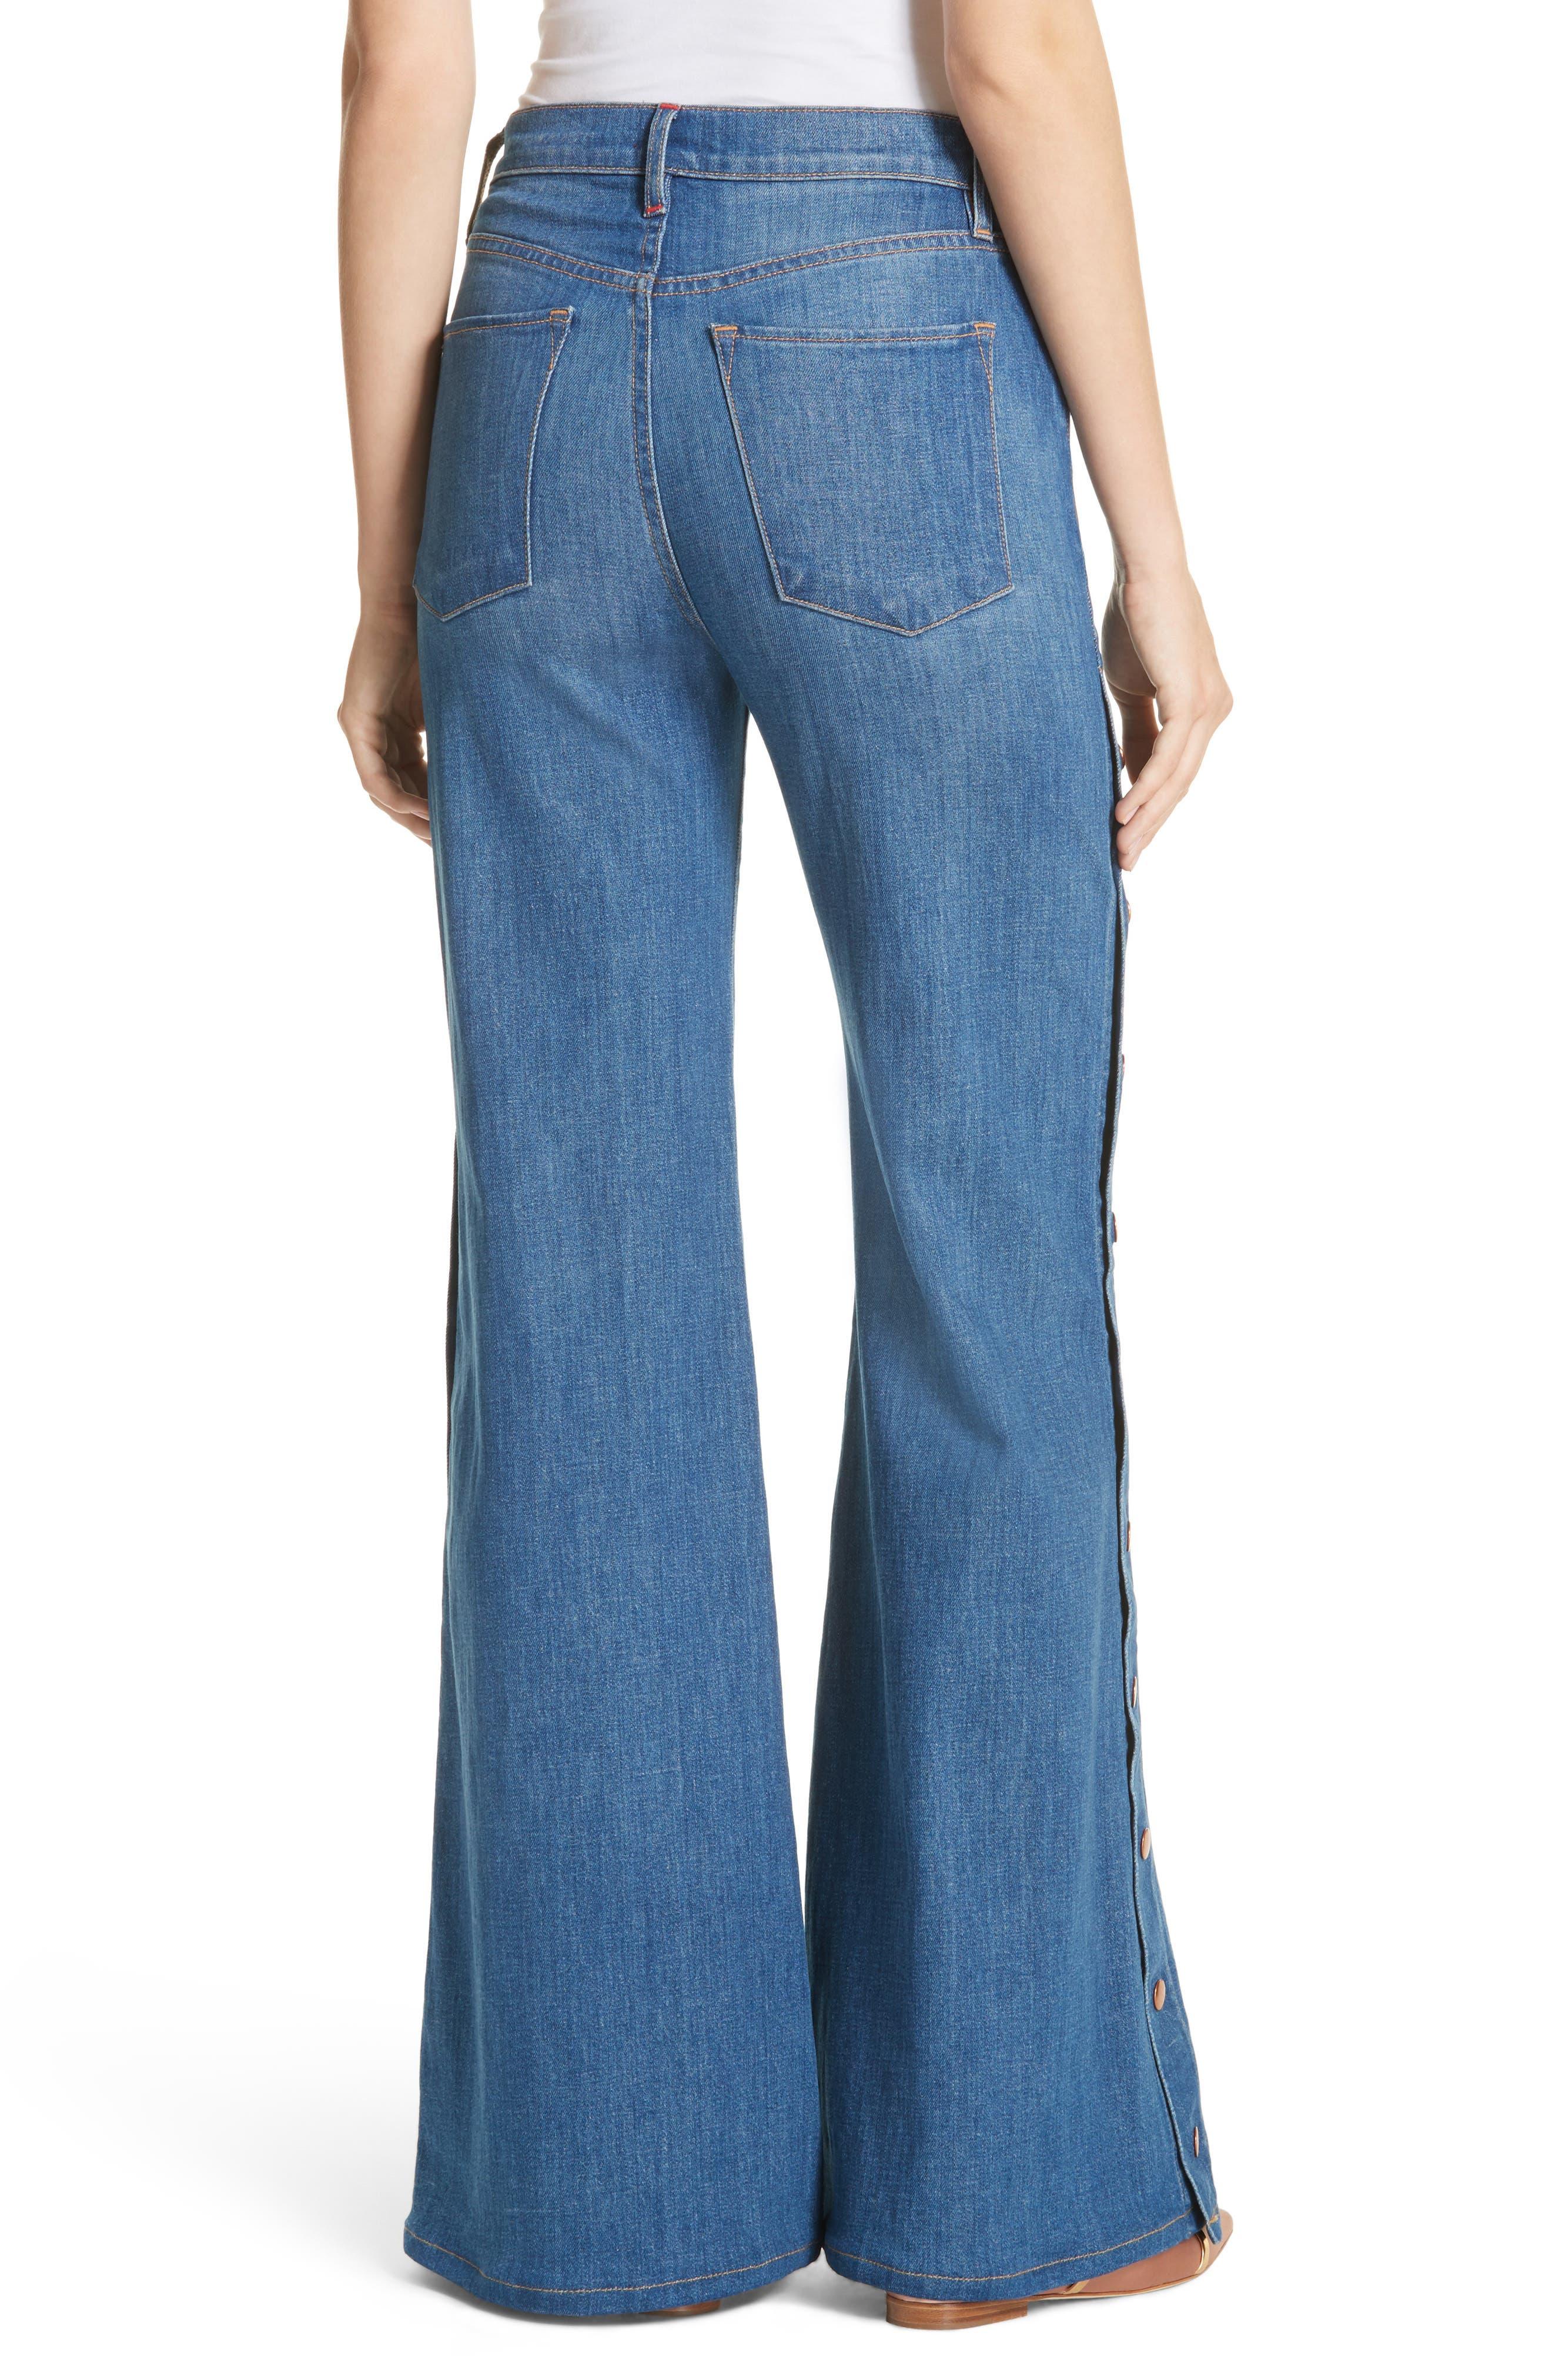 AO.LA Gorgeous Snap Side Flare Leg Jeans,                             Alternate thumbnail 2, color,                             French Blue